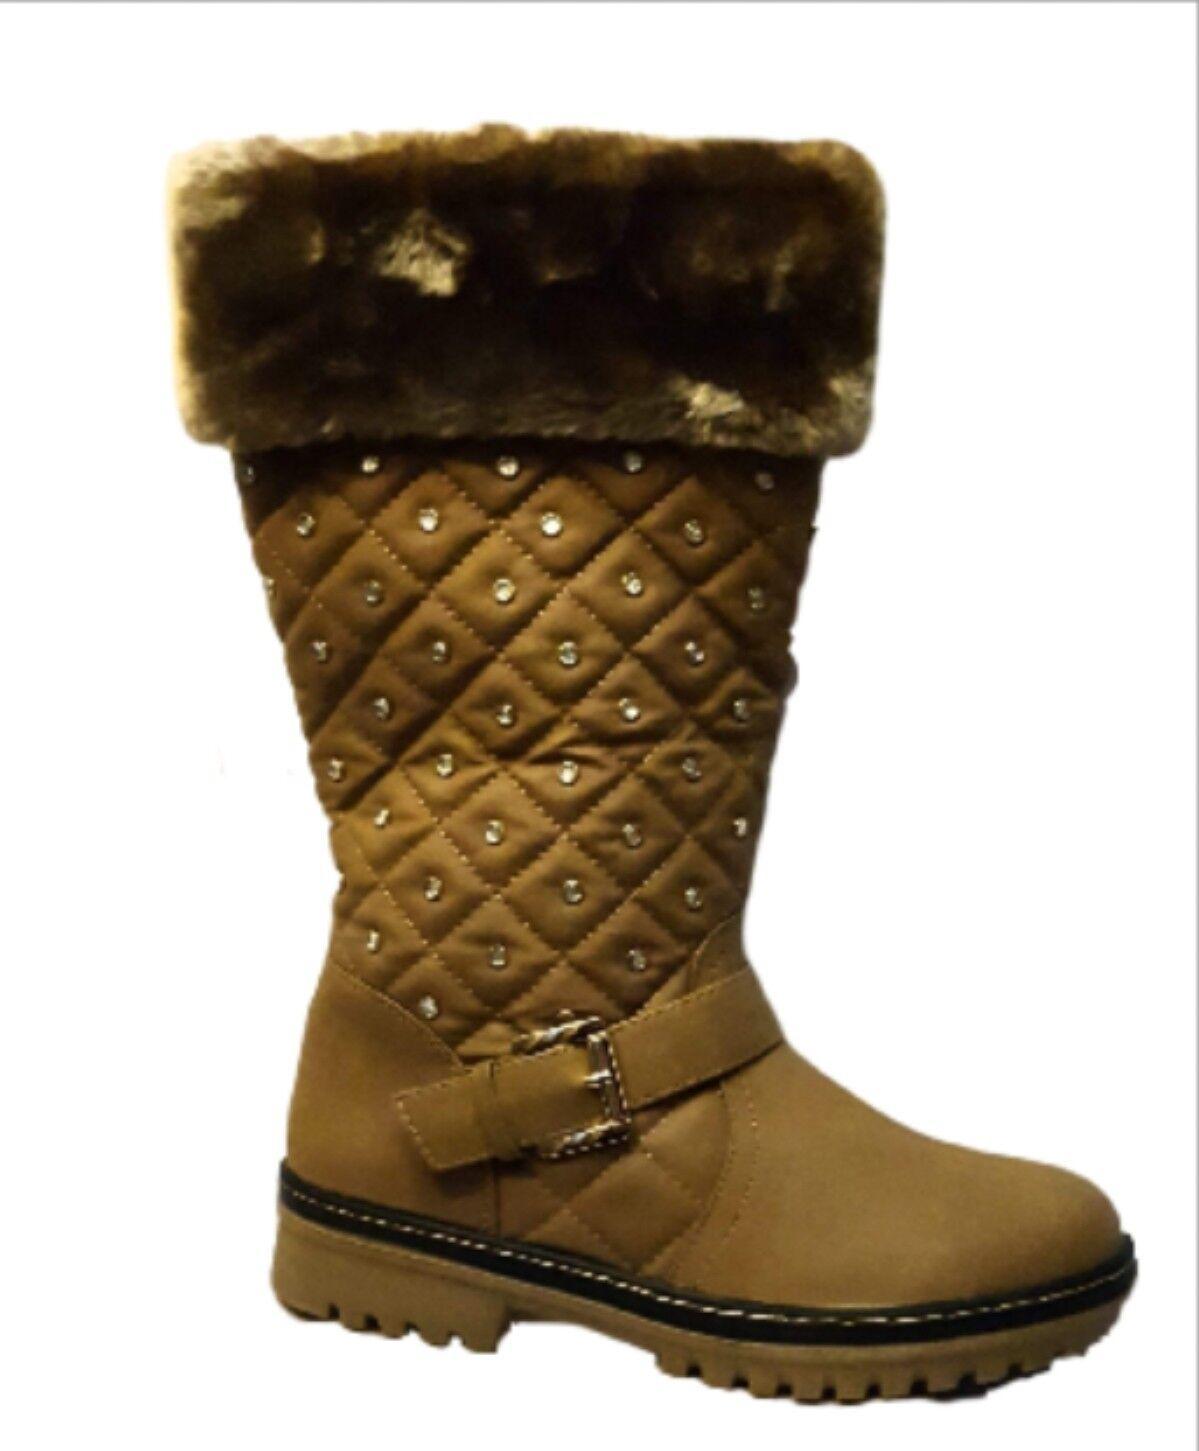 Winter Mid Calf Diamante Brown Camel Tan Fur Boots Sizes 4,6,